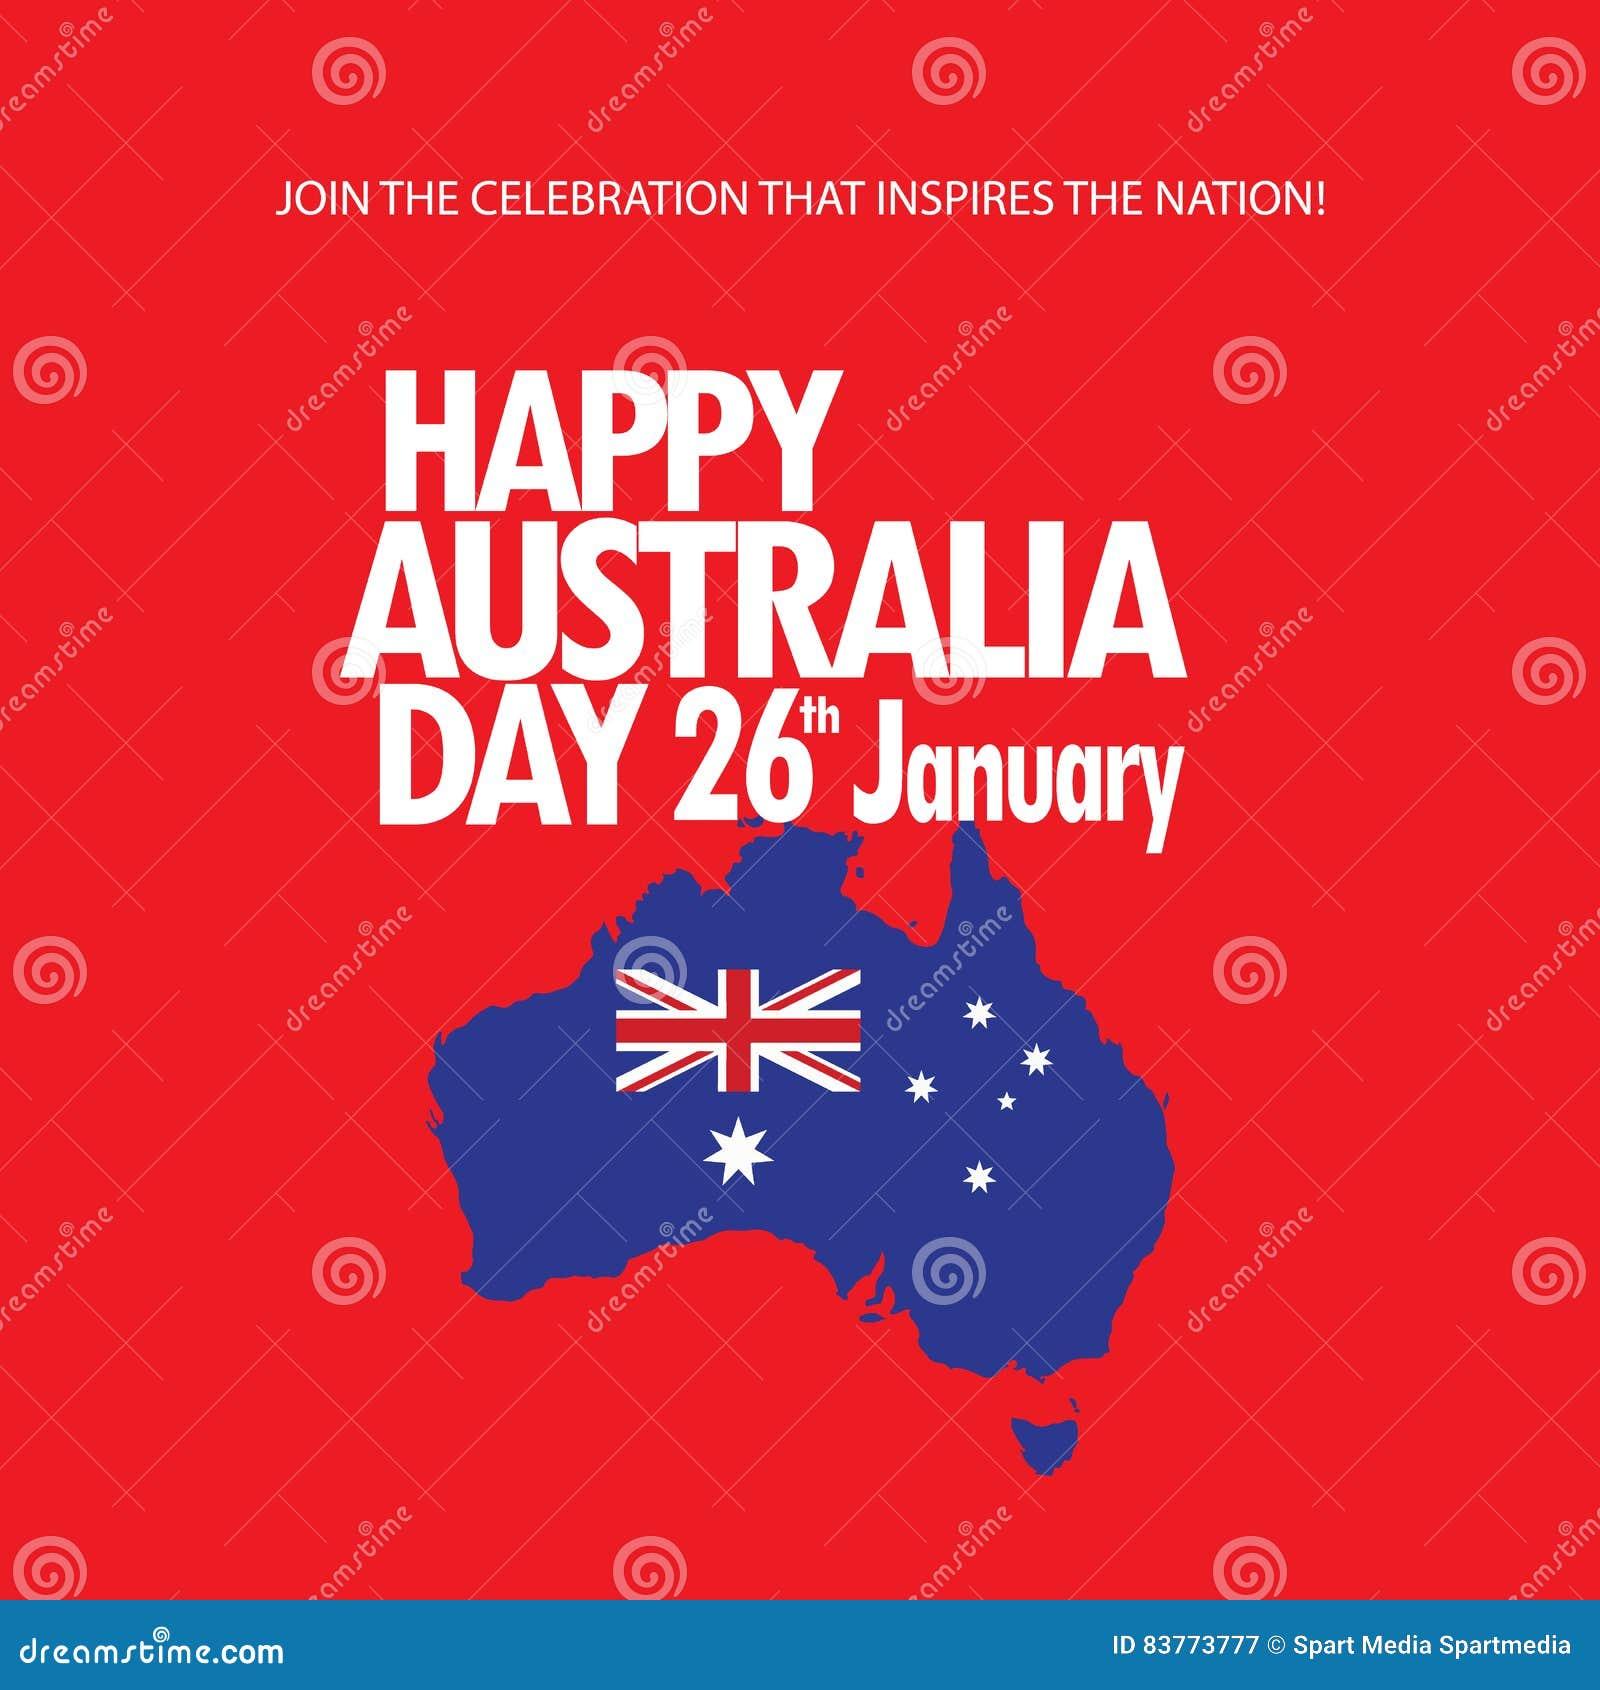 Australia Day Stock Vector Illustration Of Asian Event 83773777